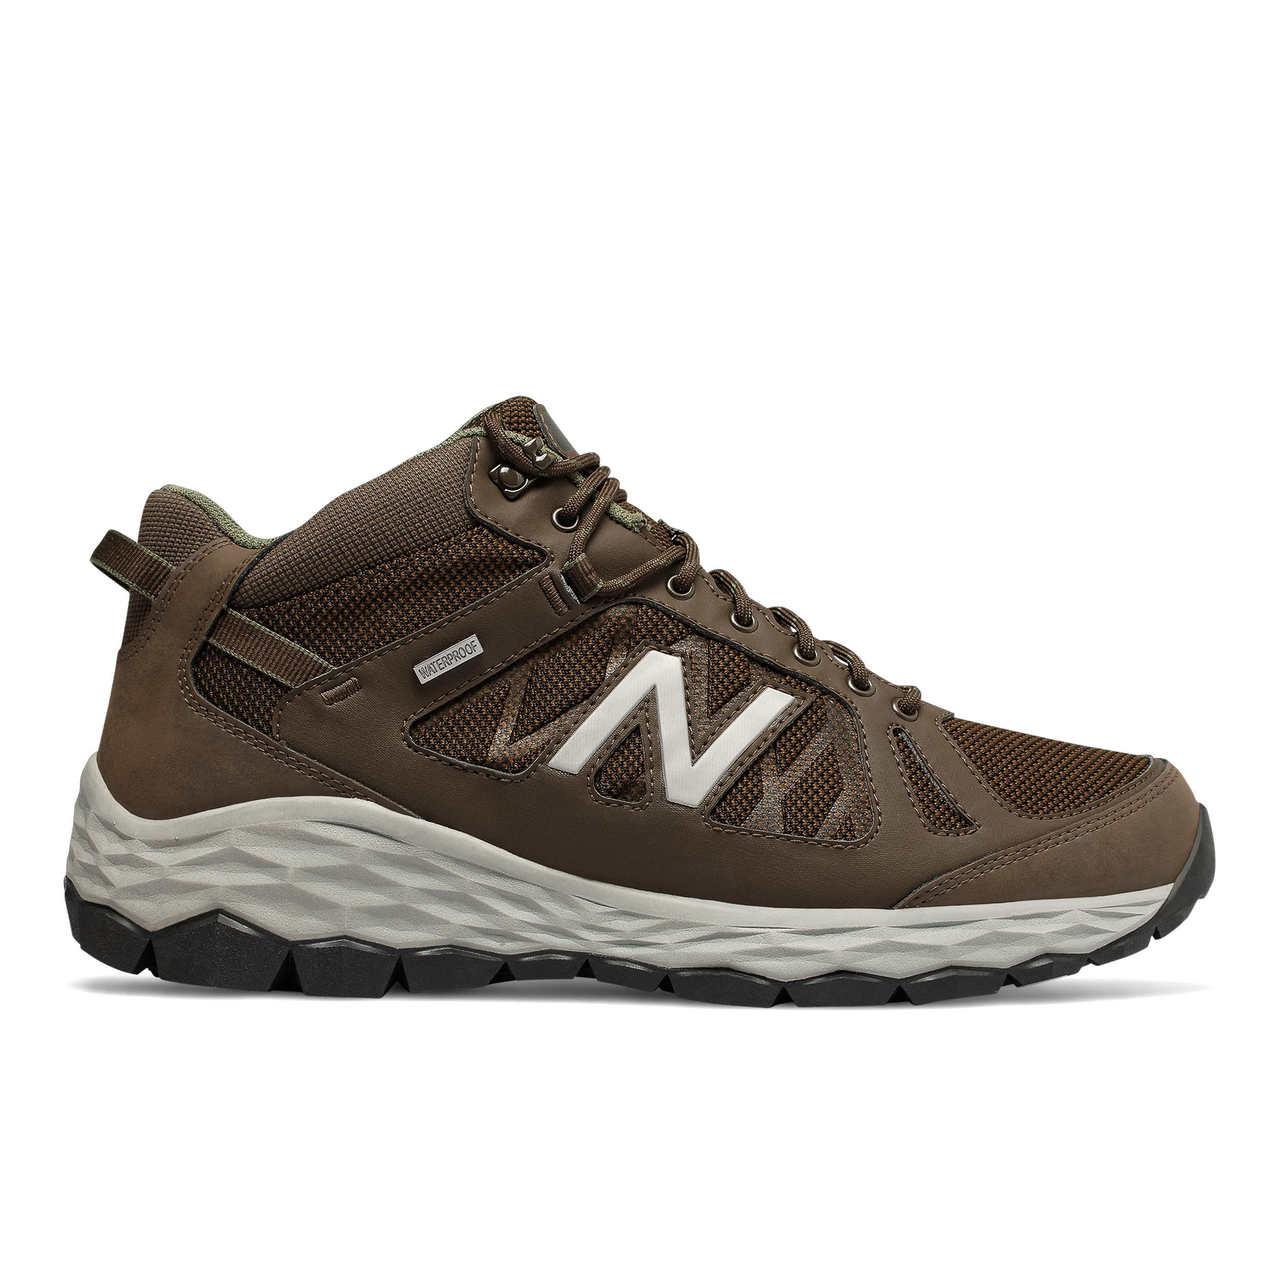 9534e7ed67853 New Balance MW1450. Men's Waterproof Trail Walker Boot. - Active Soles